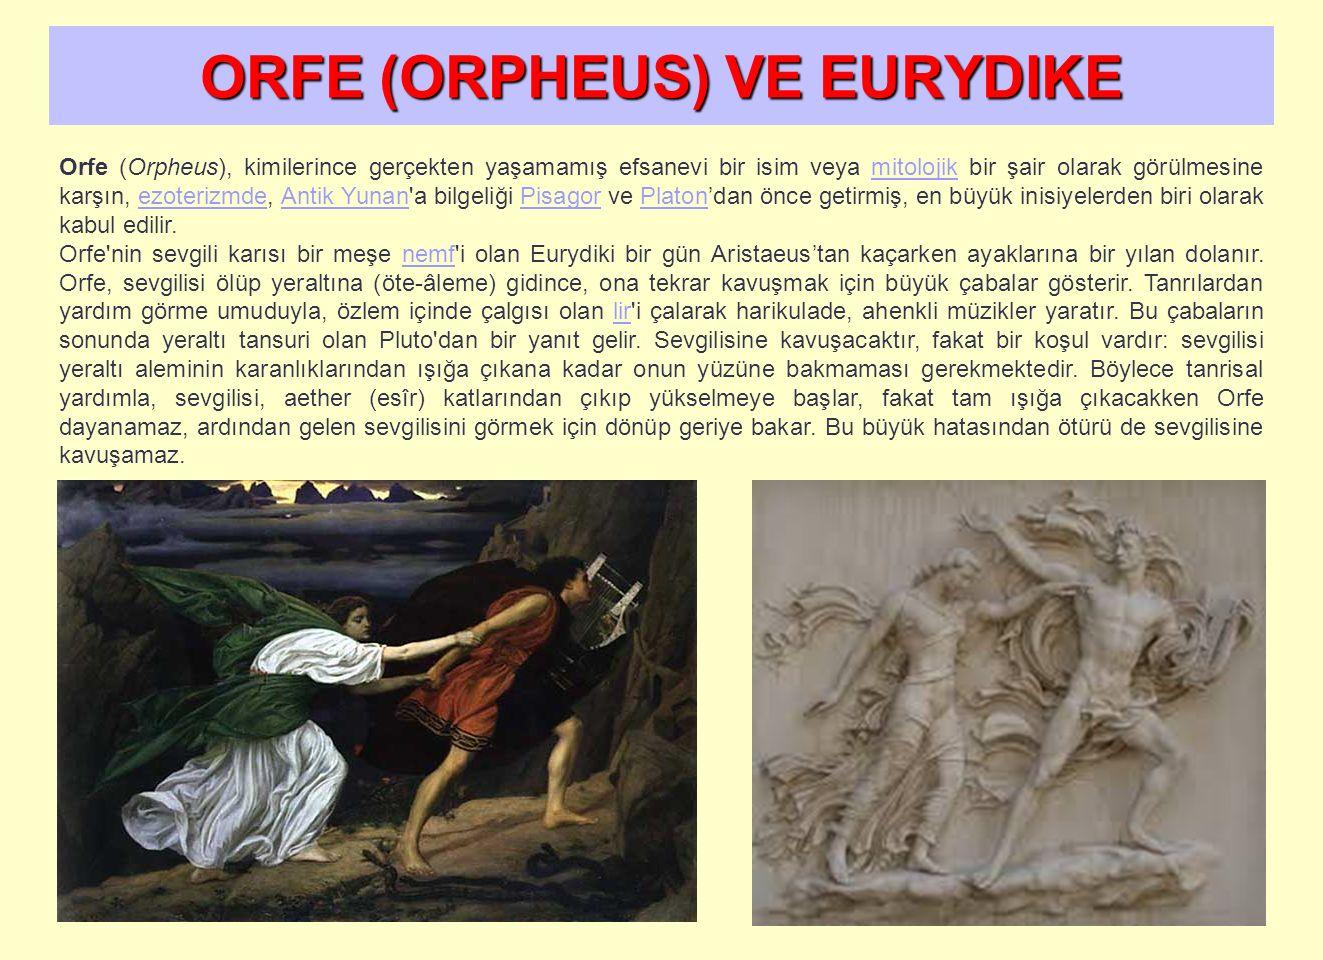 Orfe Yunanistan'a Trakya'dan ya da Asya'dan gelmiş olmalıdır.